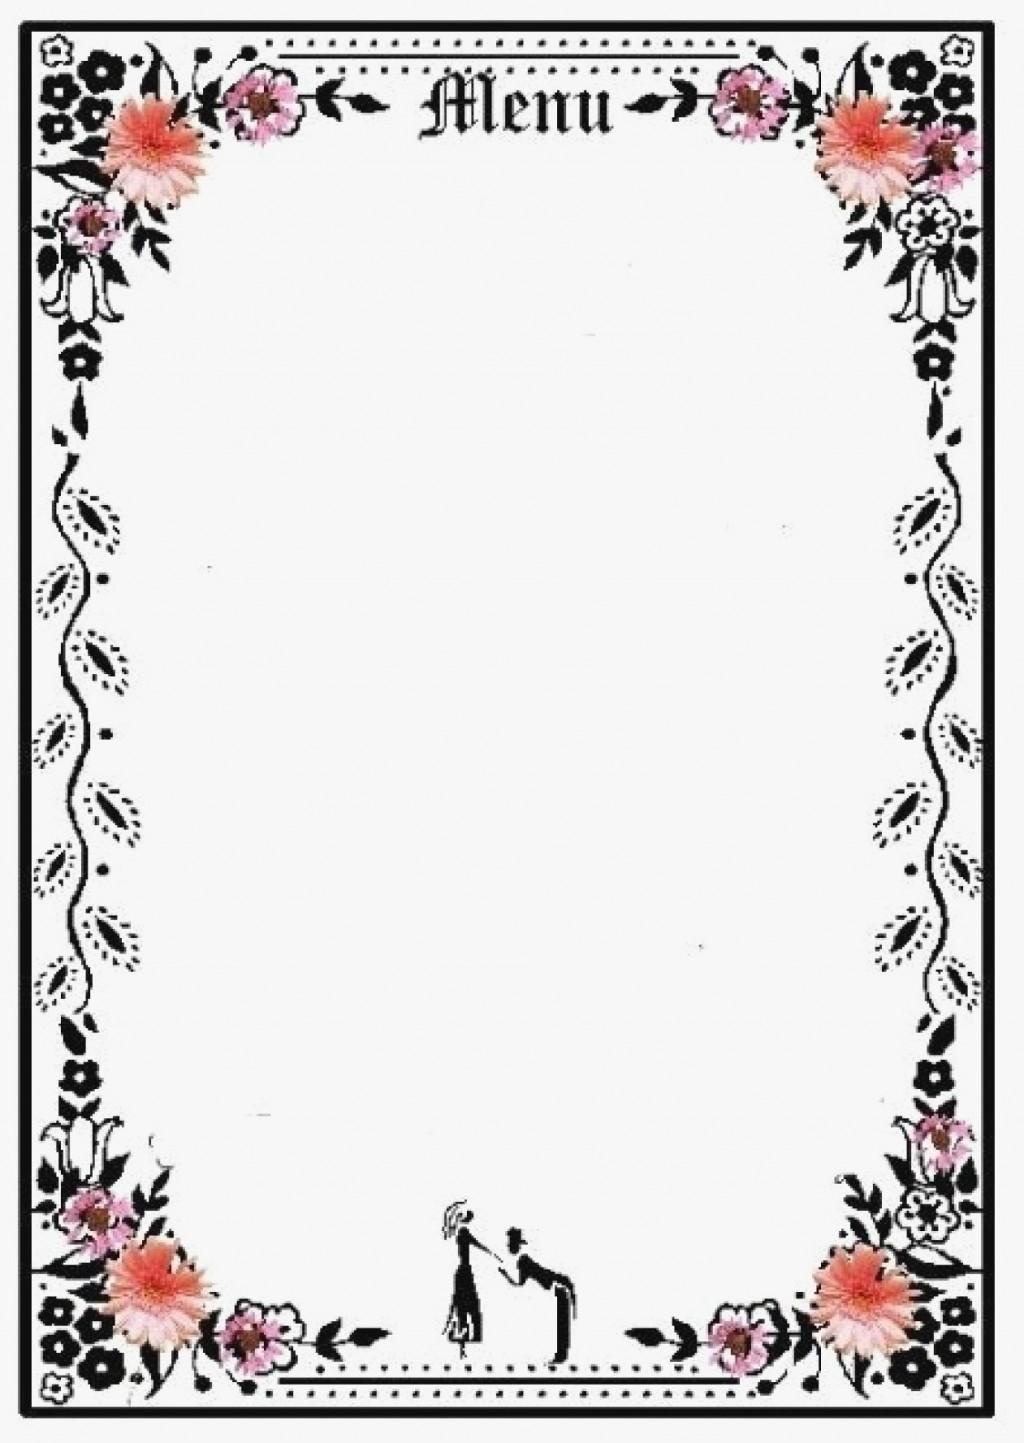 003 Wonderful Blank Restaurant Menu Template Example  Free Printable DownloadableLarge